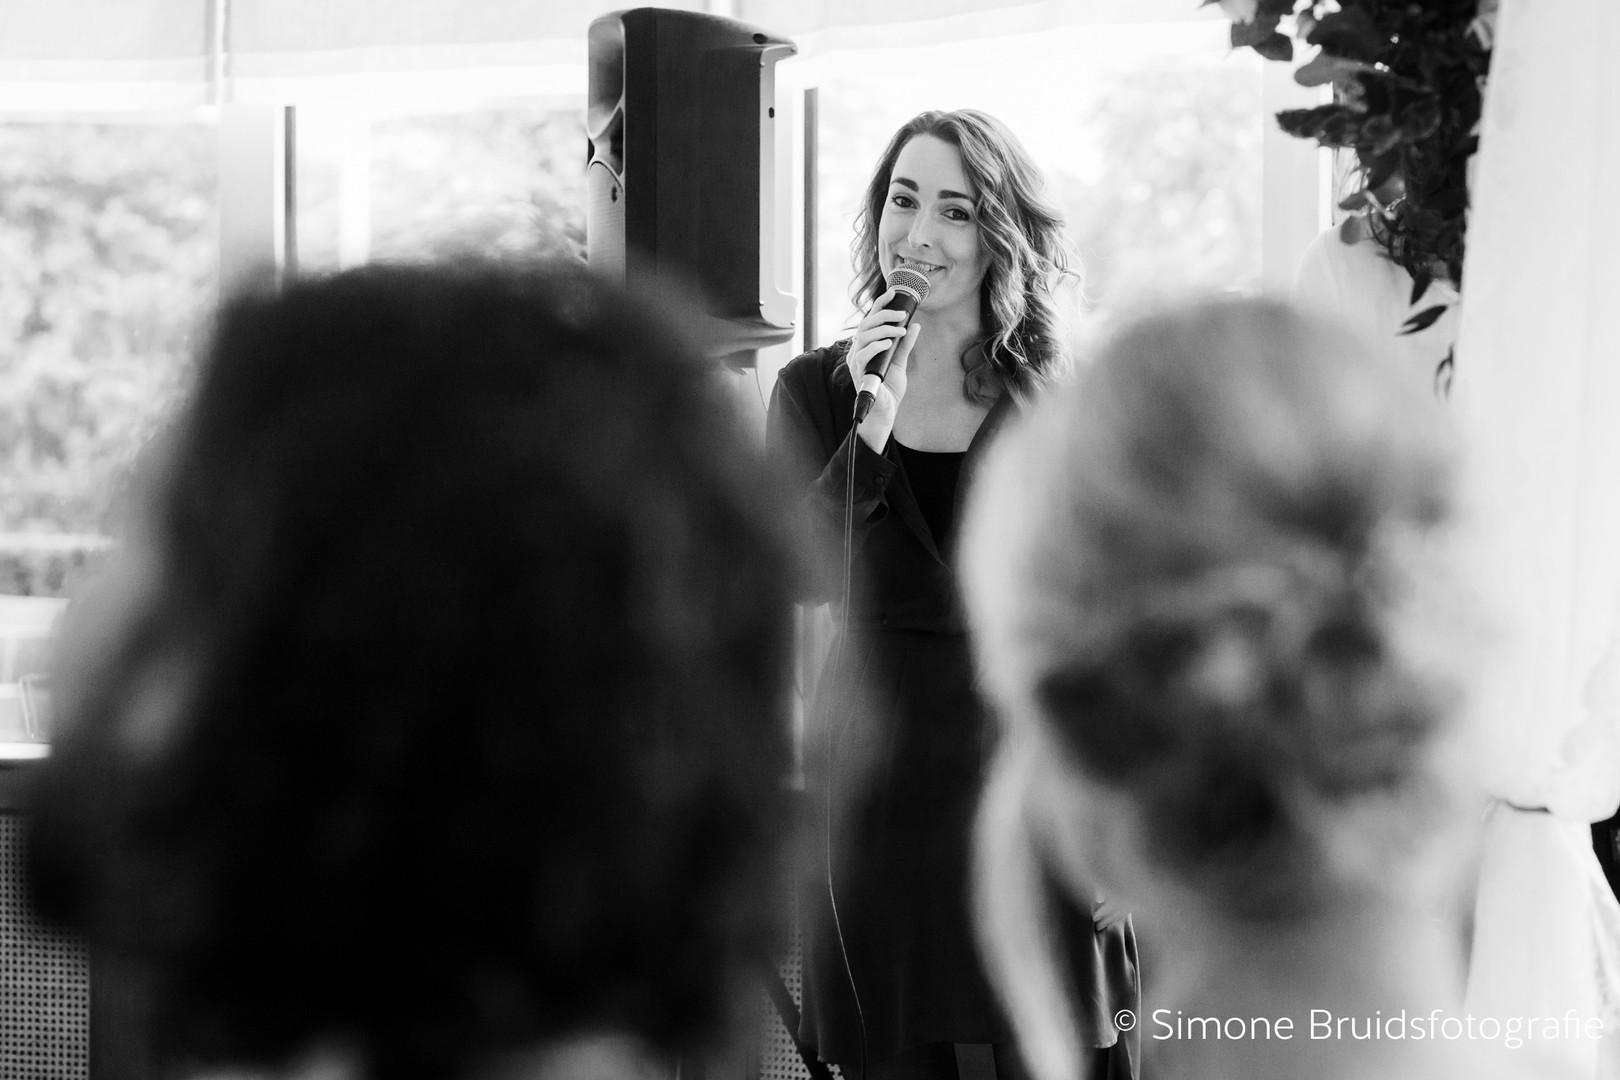 SimoneBruidsfotografie-006.jpg